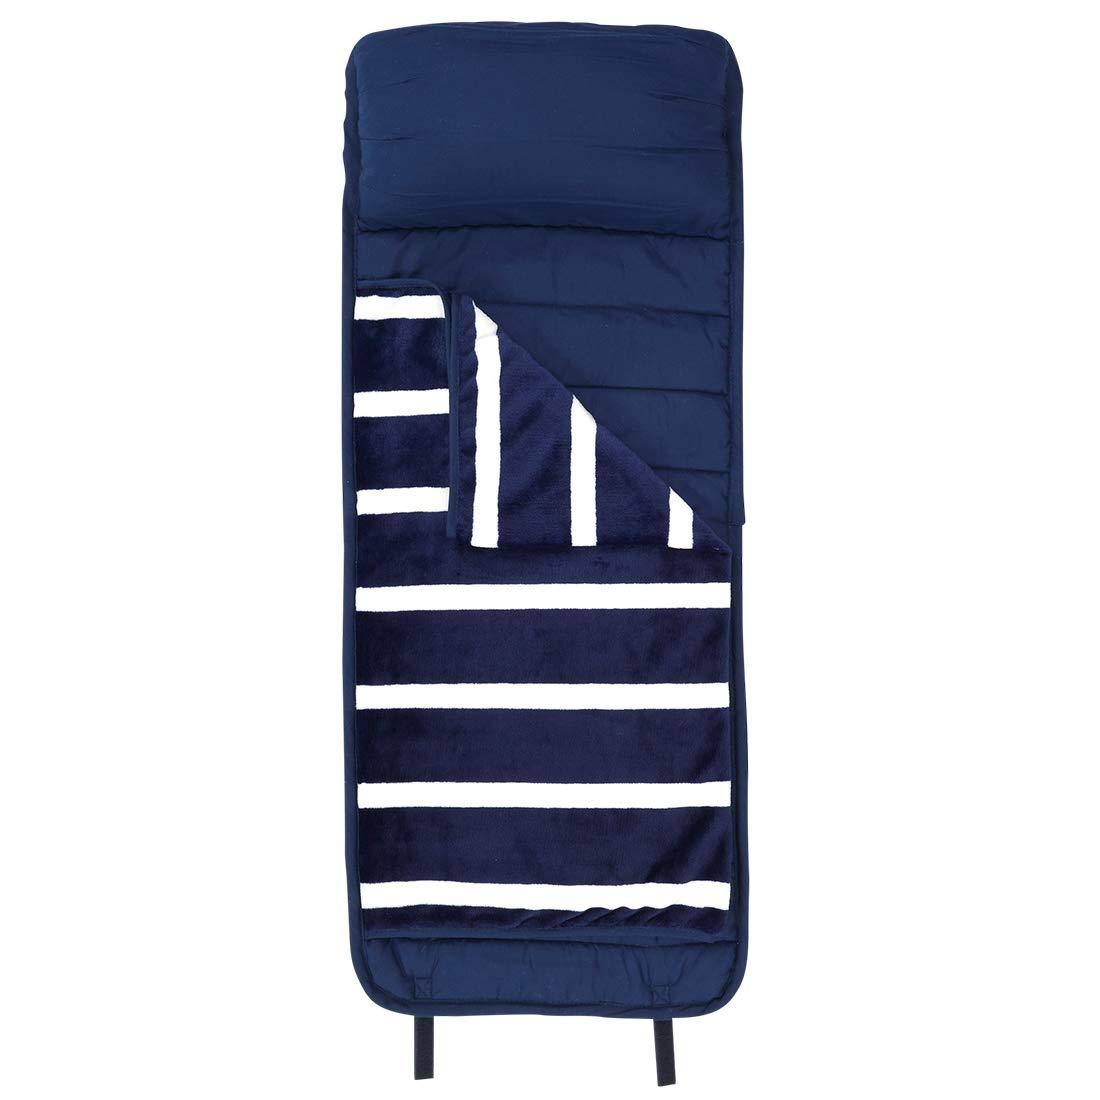 WB Nap Mat Navy Blue Stripe 47 x 18 Polyester Plush Fabric Slumber Sleeping Bag by Wholesale Boutique